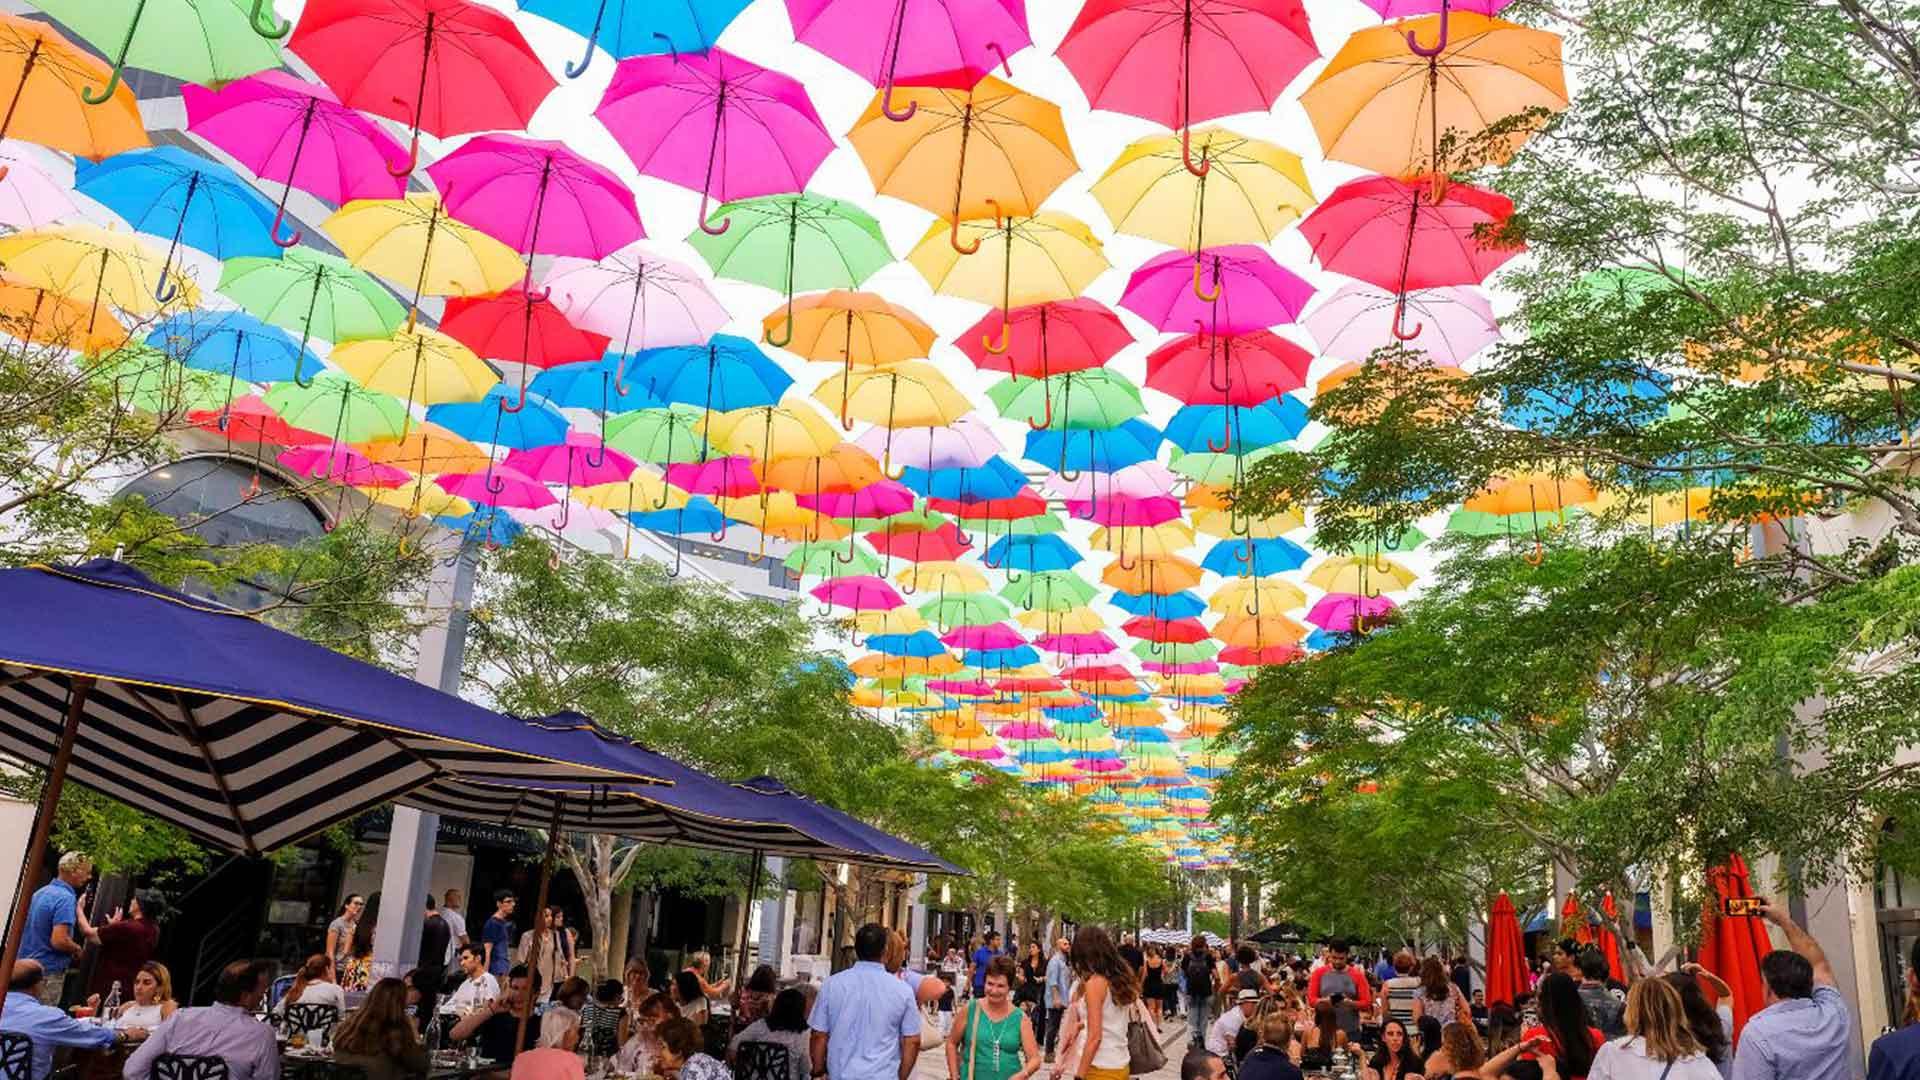 Umbrella Art Installation Adds Colorful Explosion to Giralda Plaza in Coral Gables 1